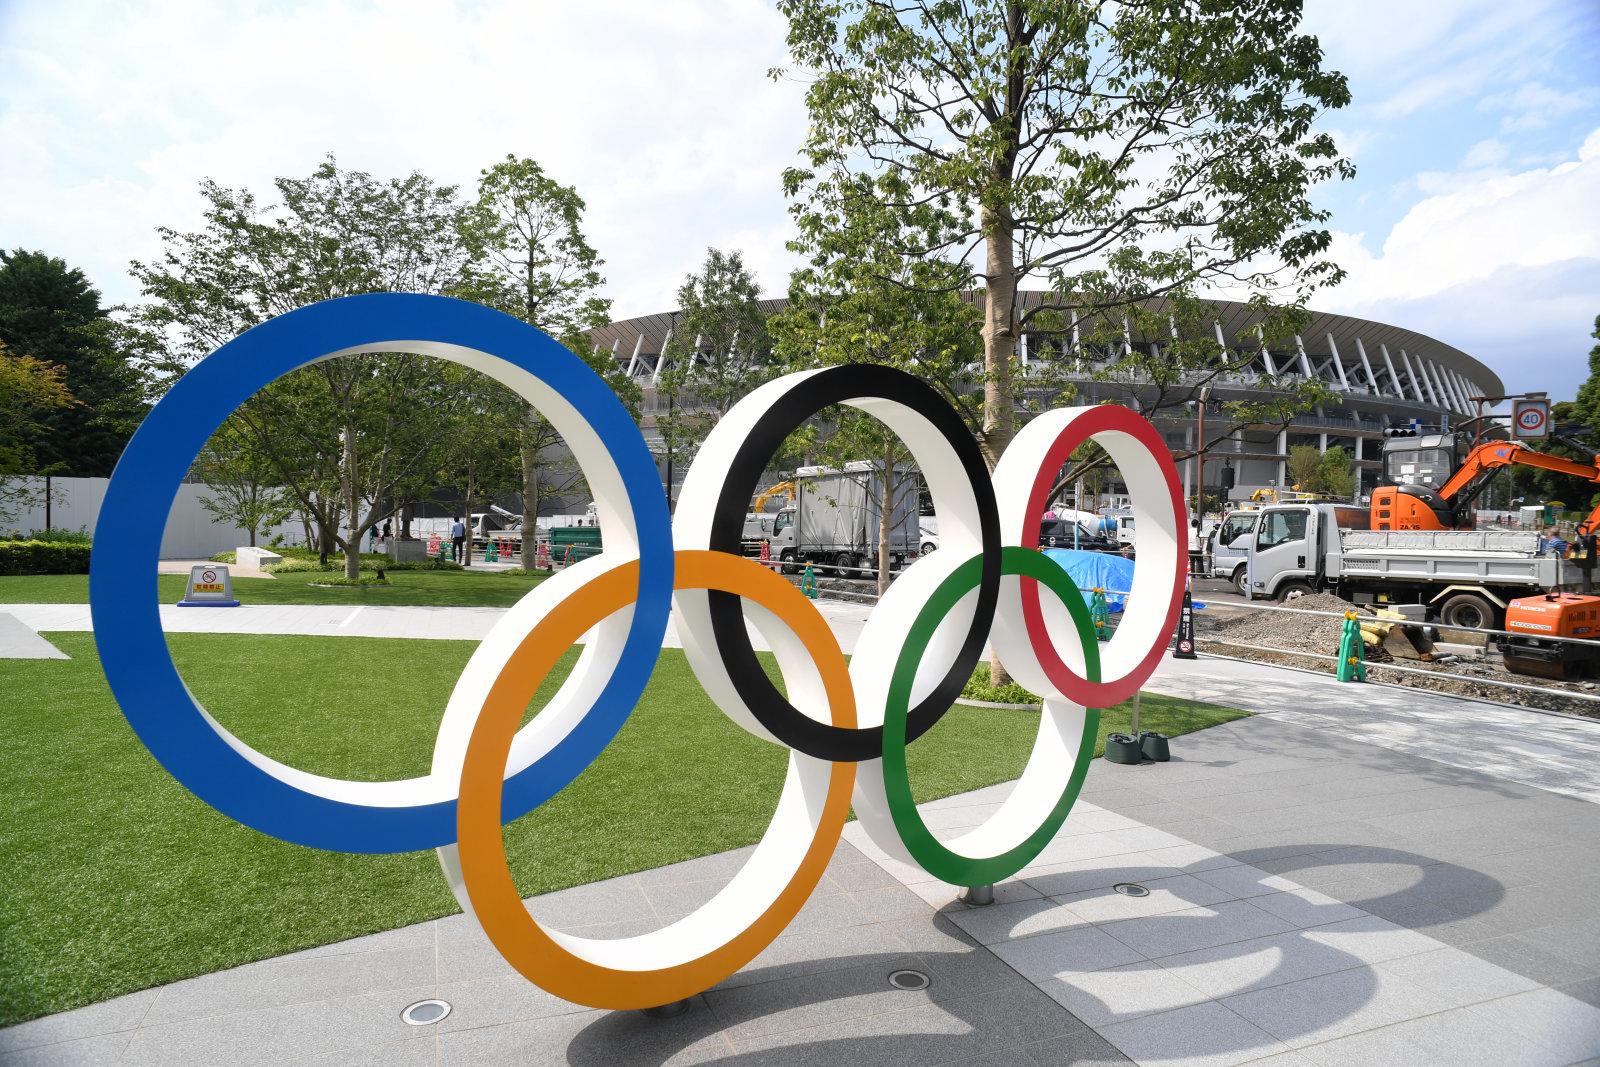 Angola athletes face financial constraints ahead of Olympics - Sports Leo